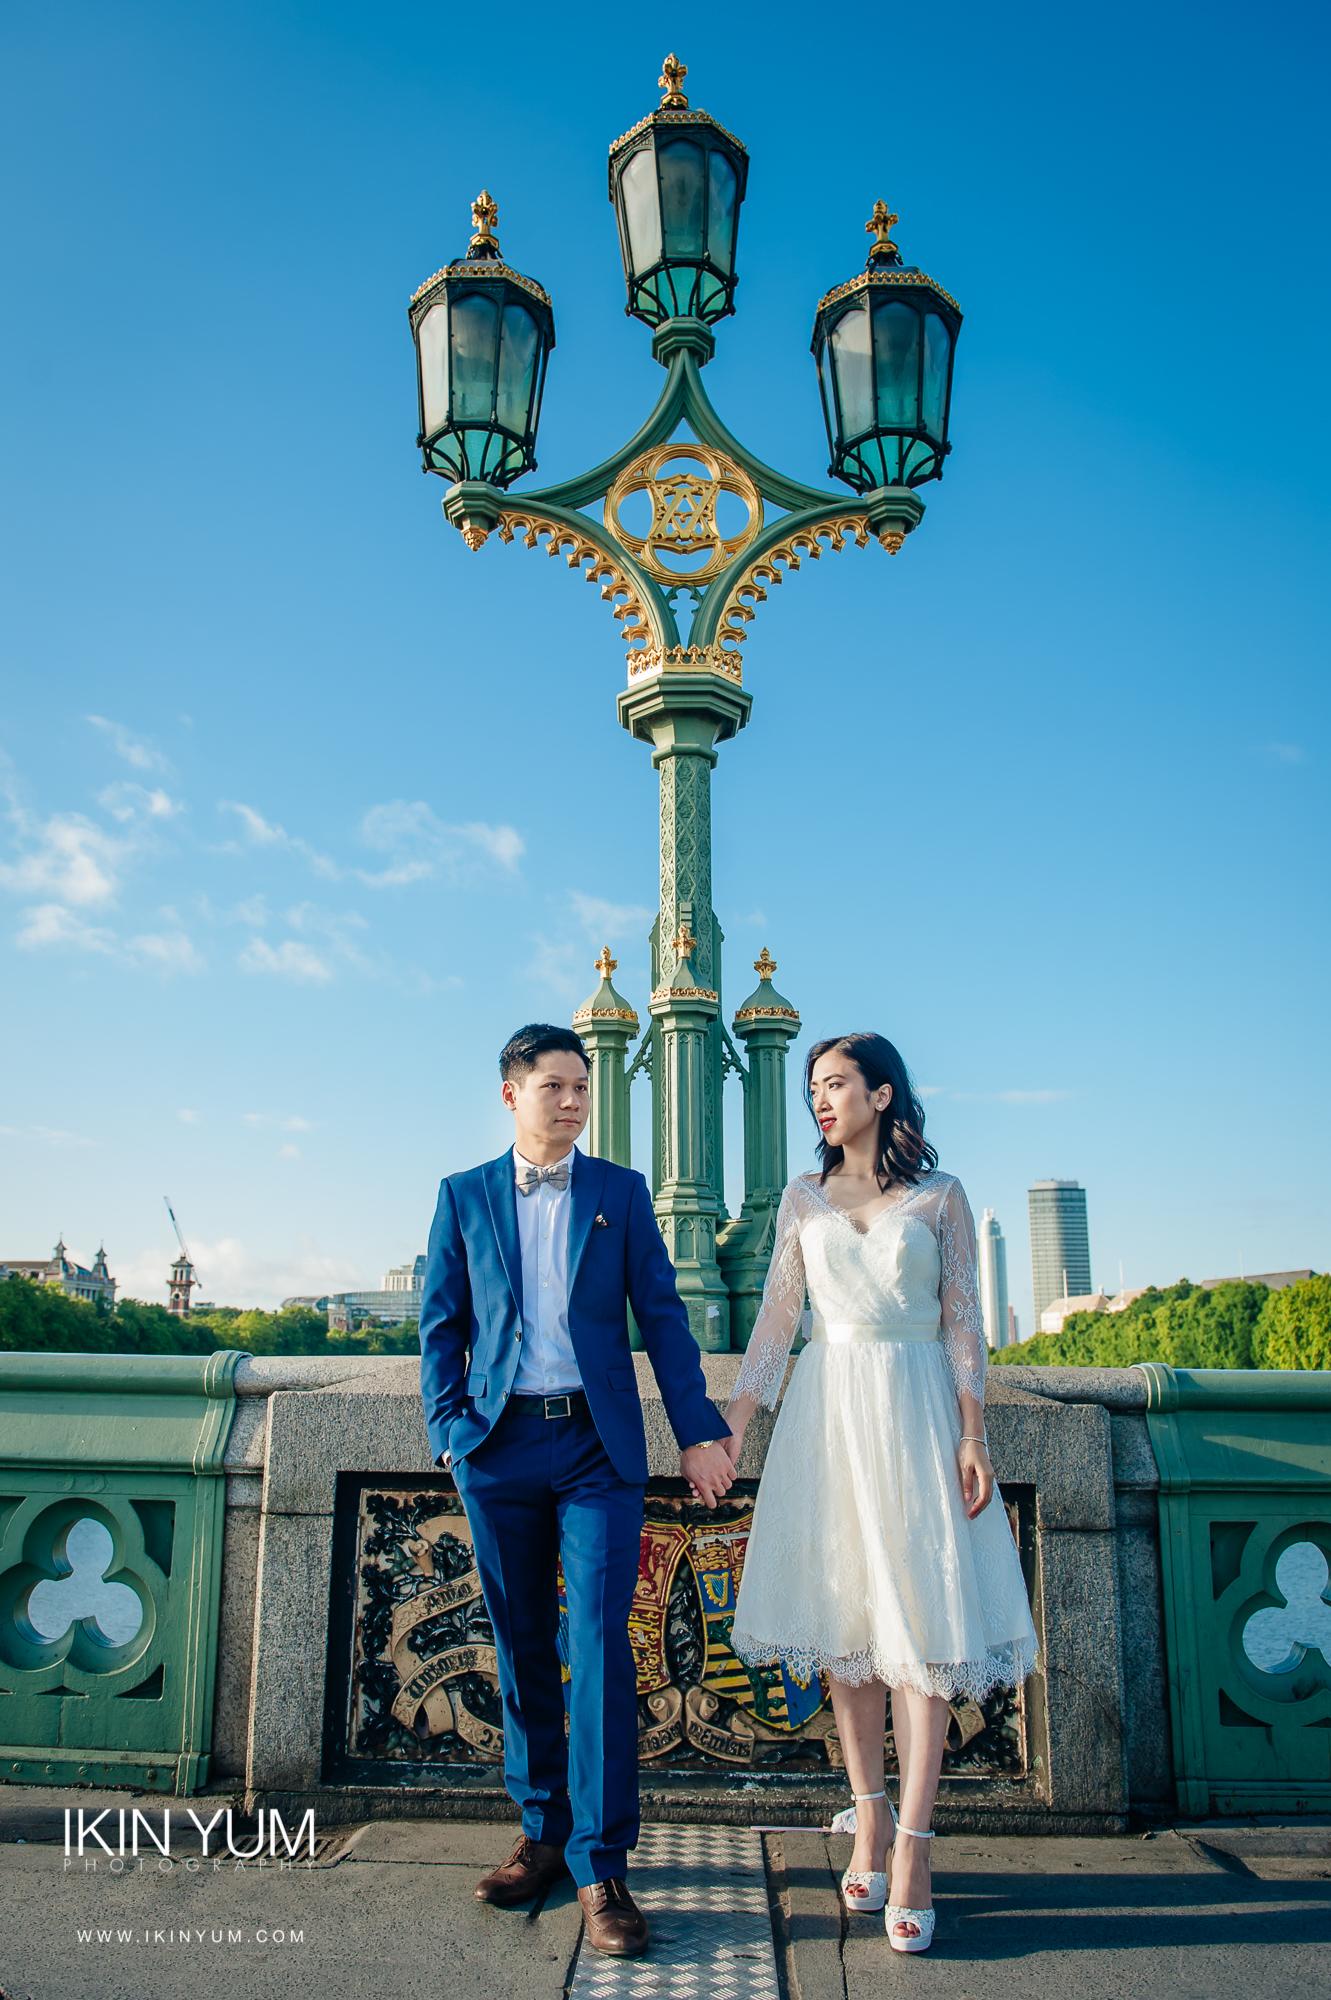 Natalie & Duncan Wedding Day - Ikin Yum Photography-004.jpg